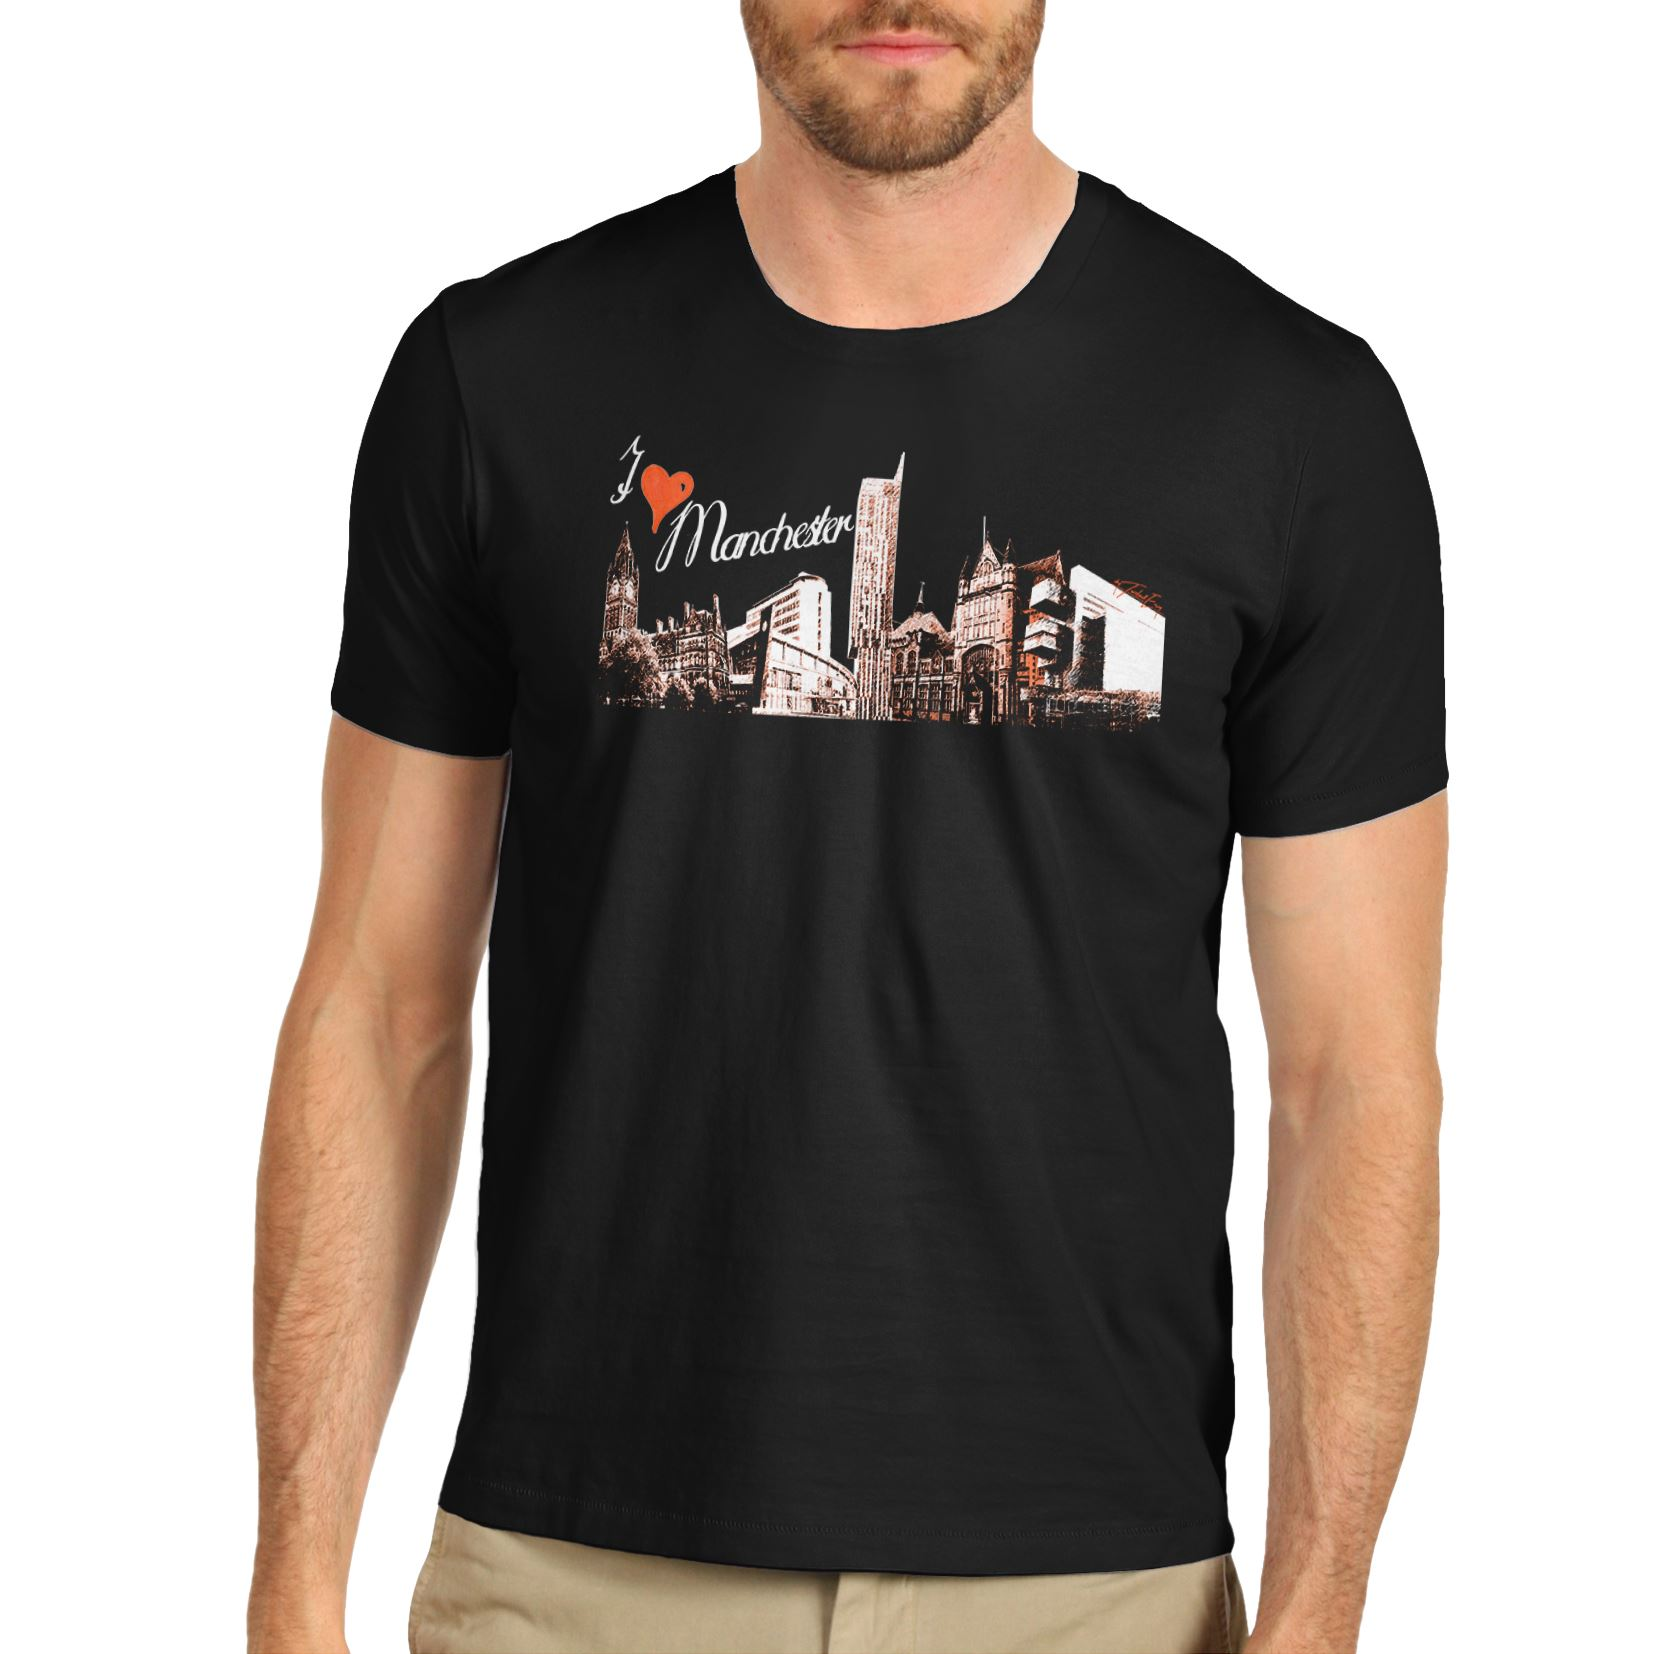 Design tshirt online free shipping - Design T Shirts Online Free